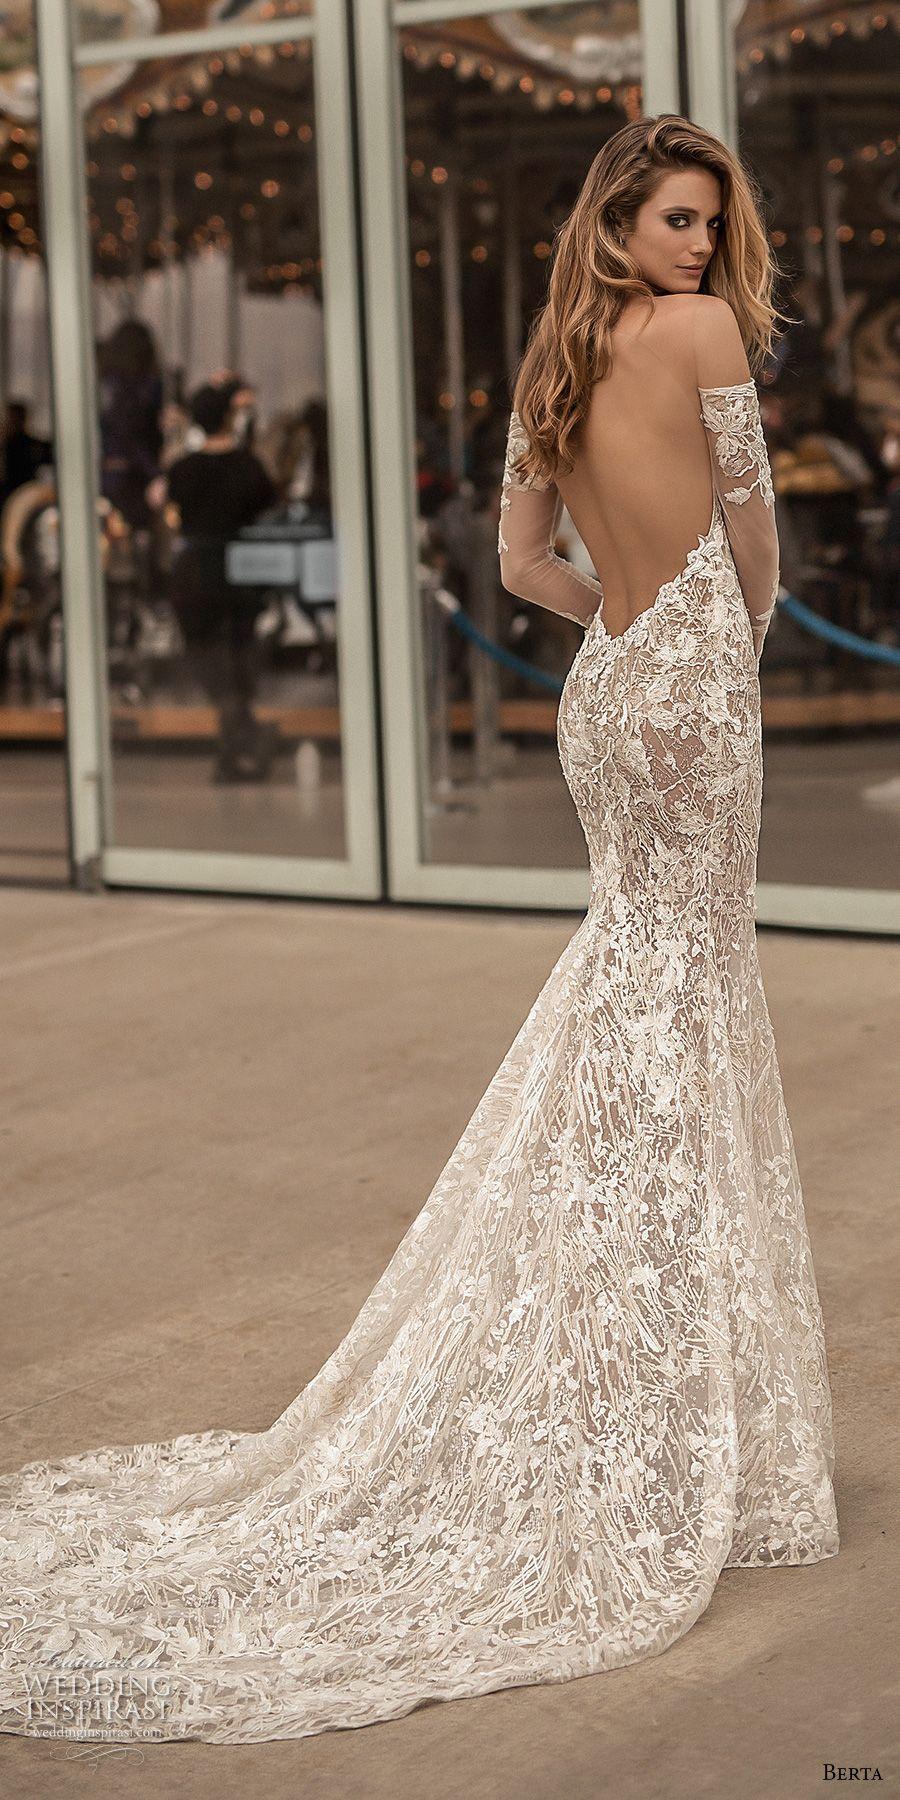 classy fancy classy elegant wedding dresses